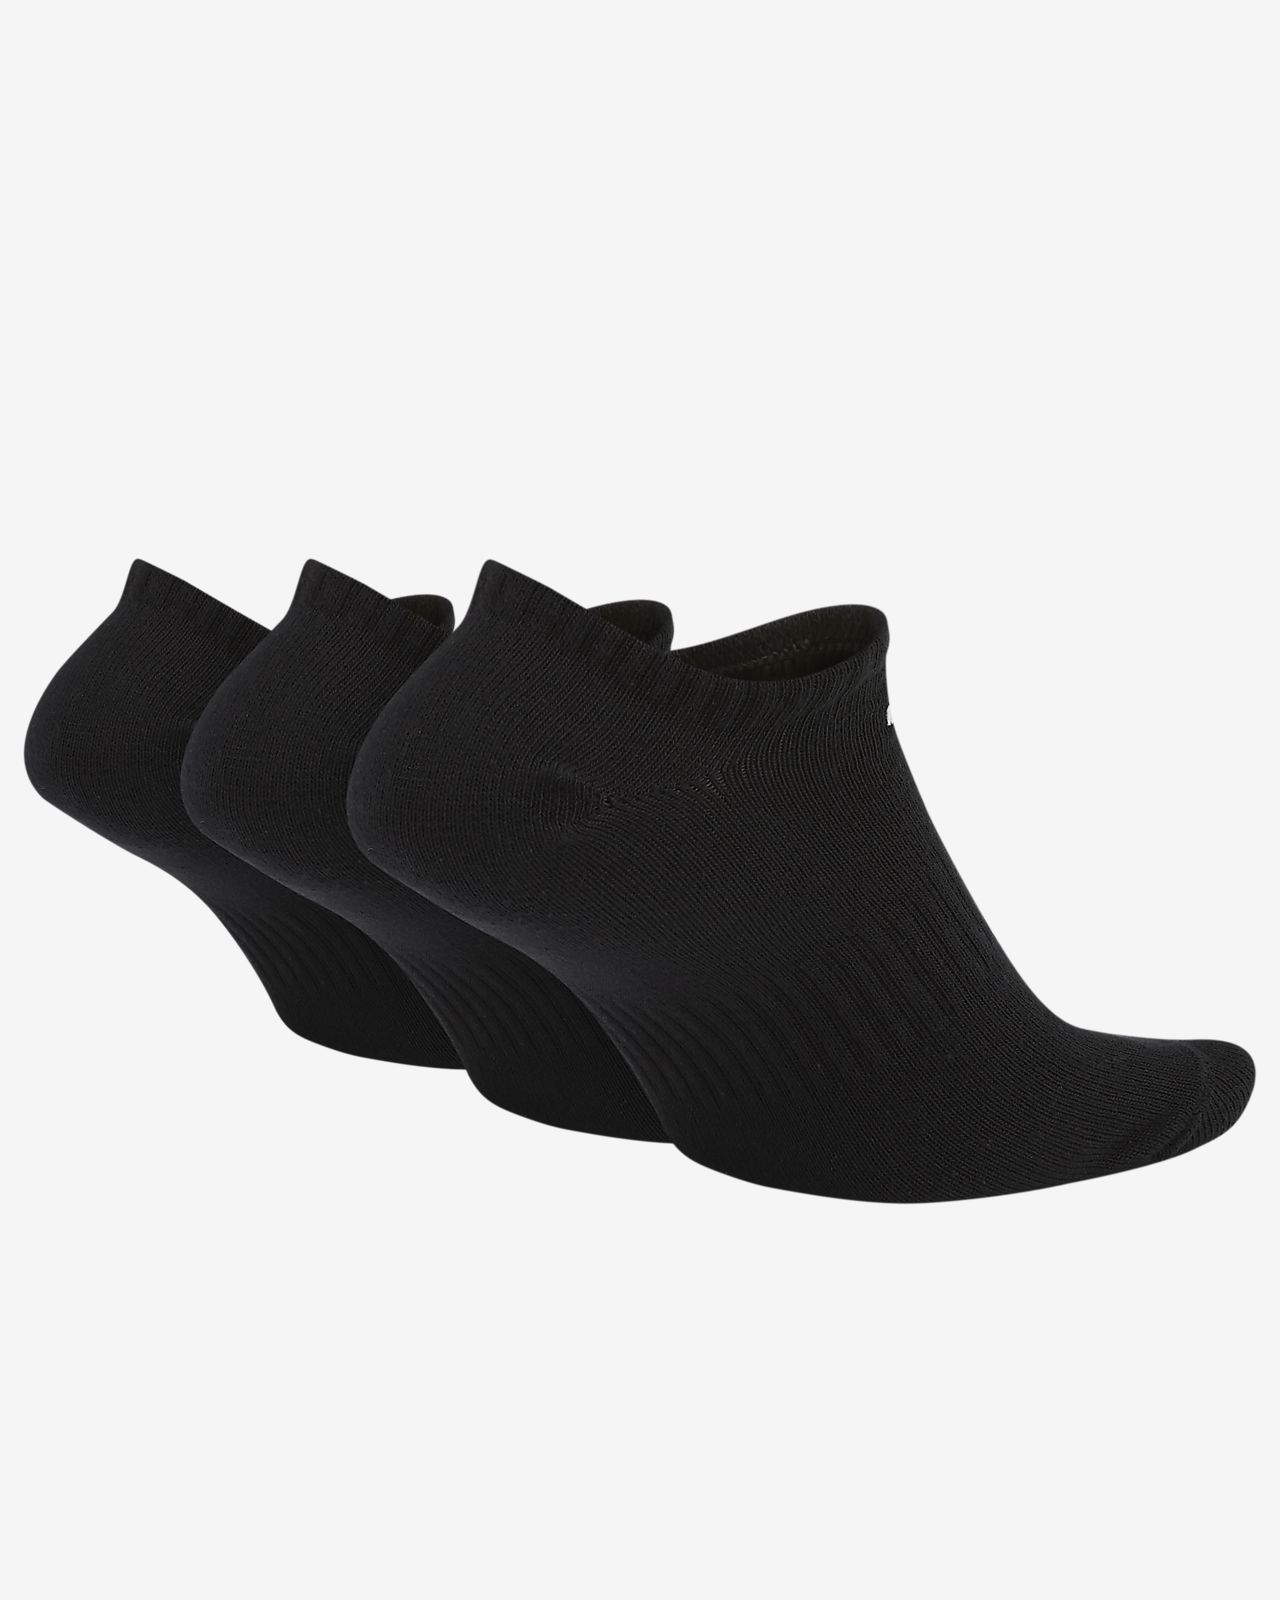 Nike Everyday Lightweight No Show Training calze (3 Pack